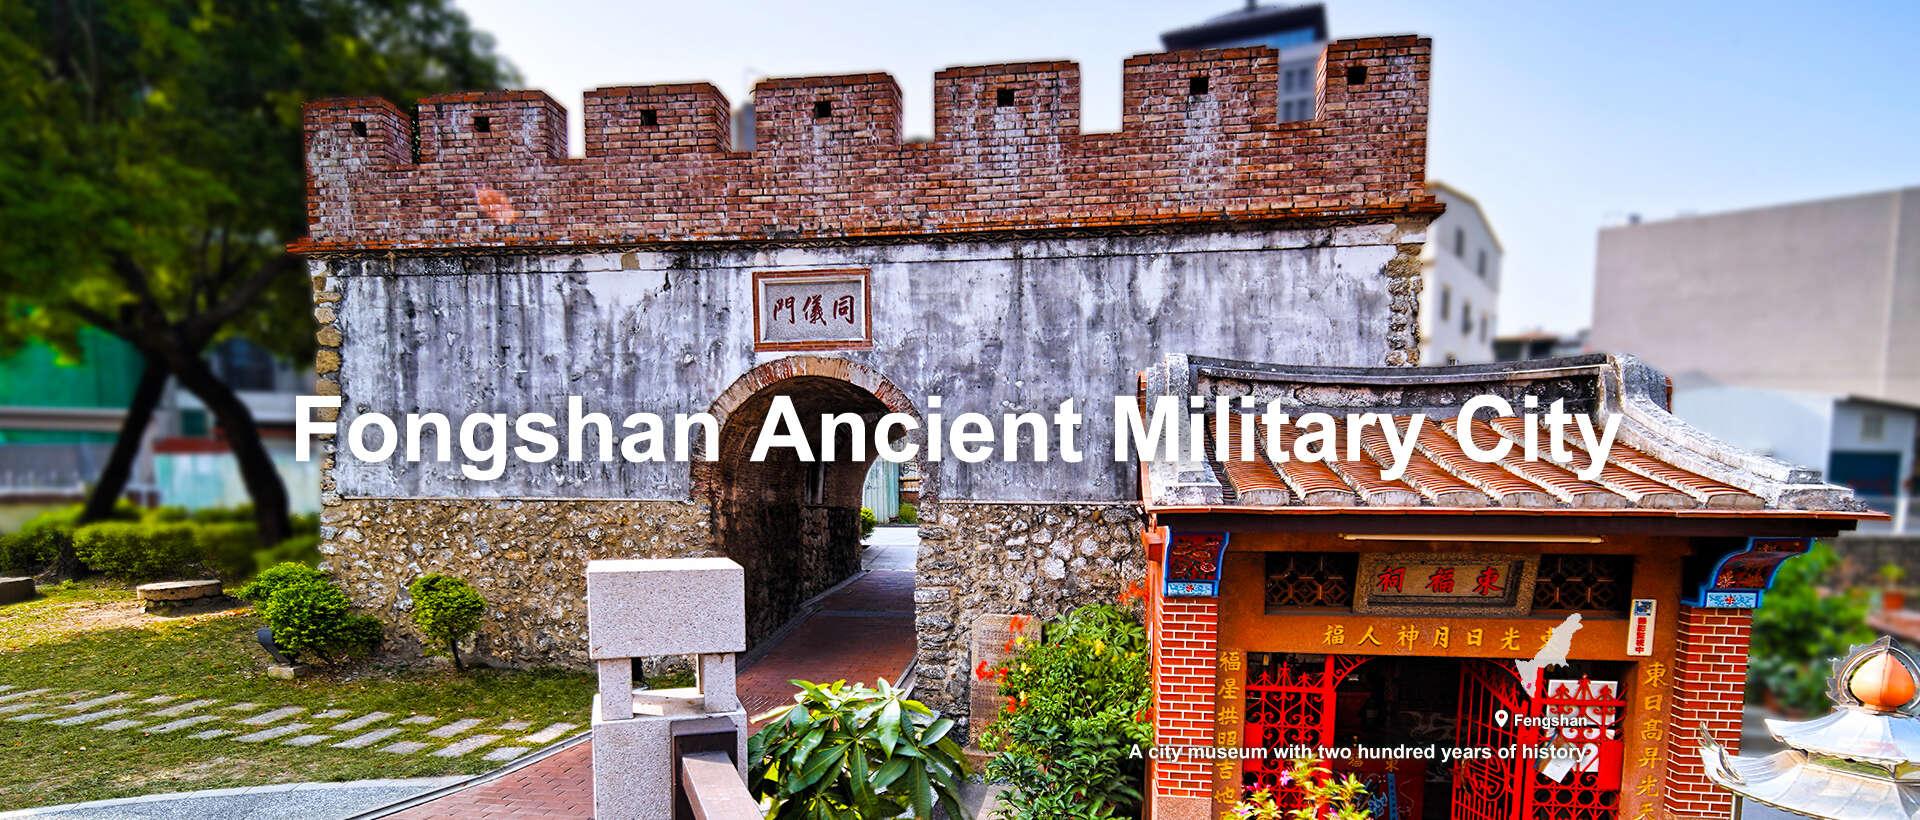 Fongshan Ancient Military City